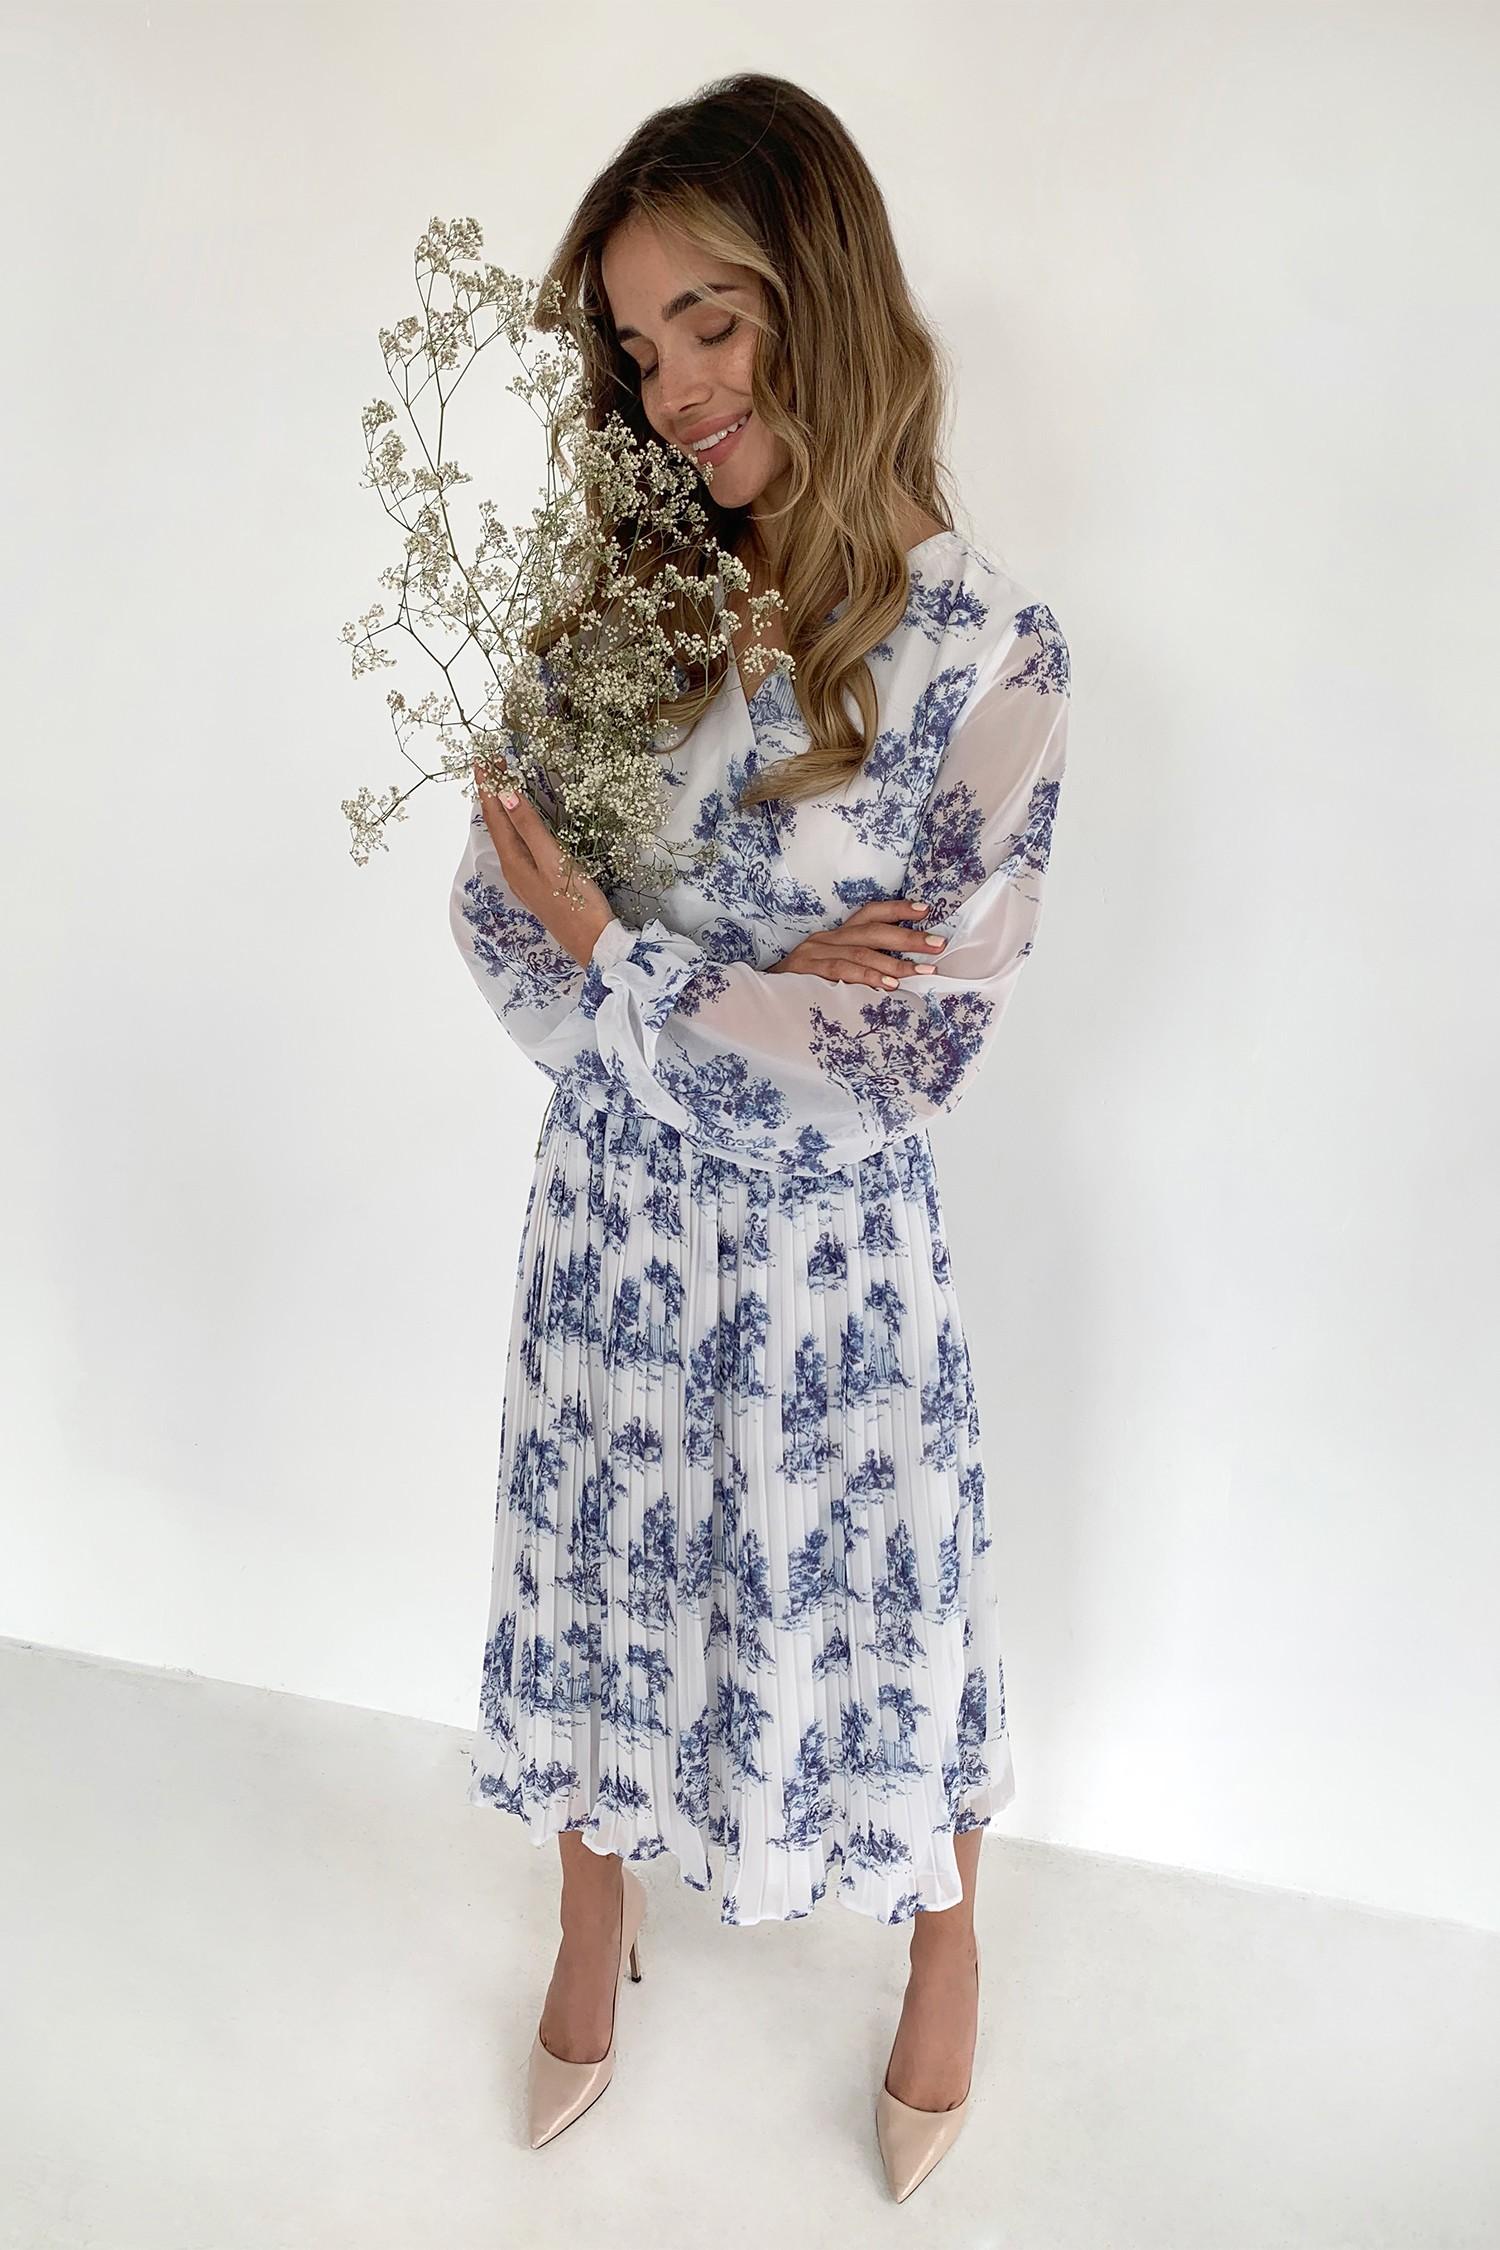 Платье миди на запах с юбкой плиссе Toile de Jouy - THE LACE